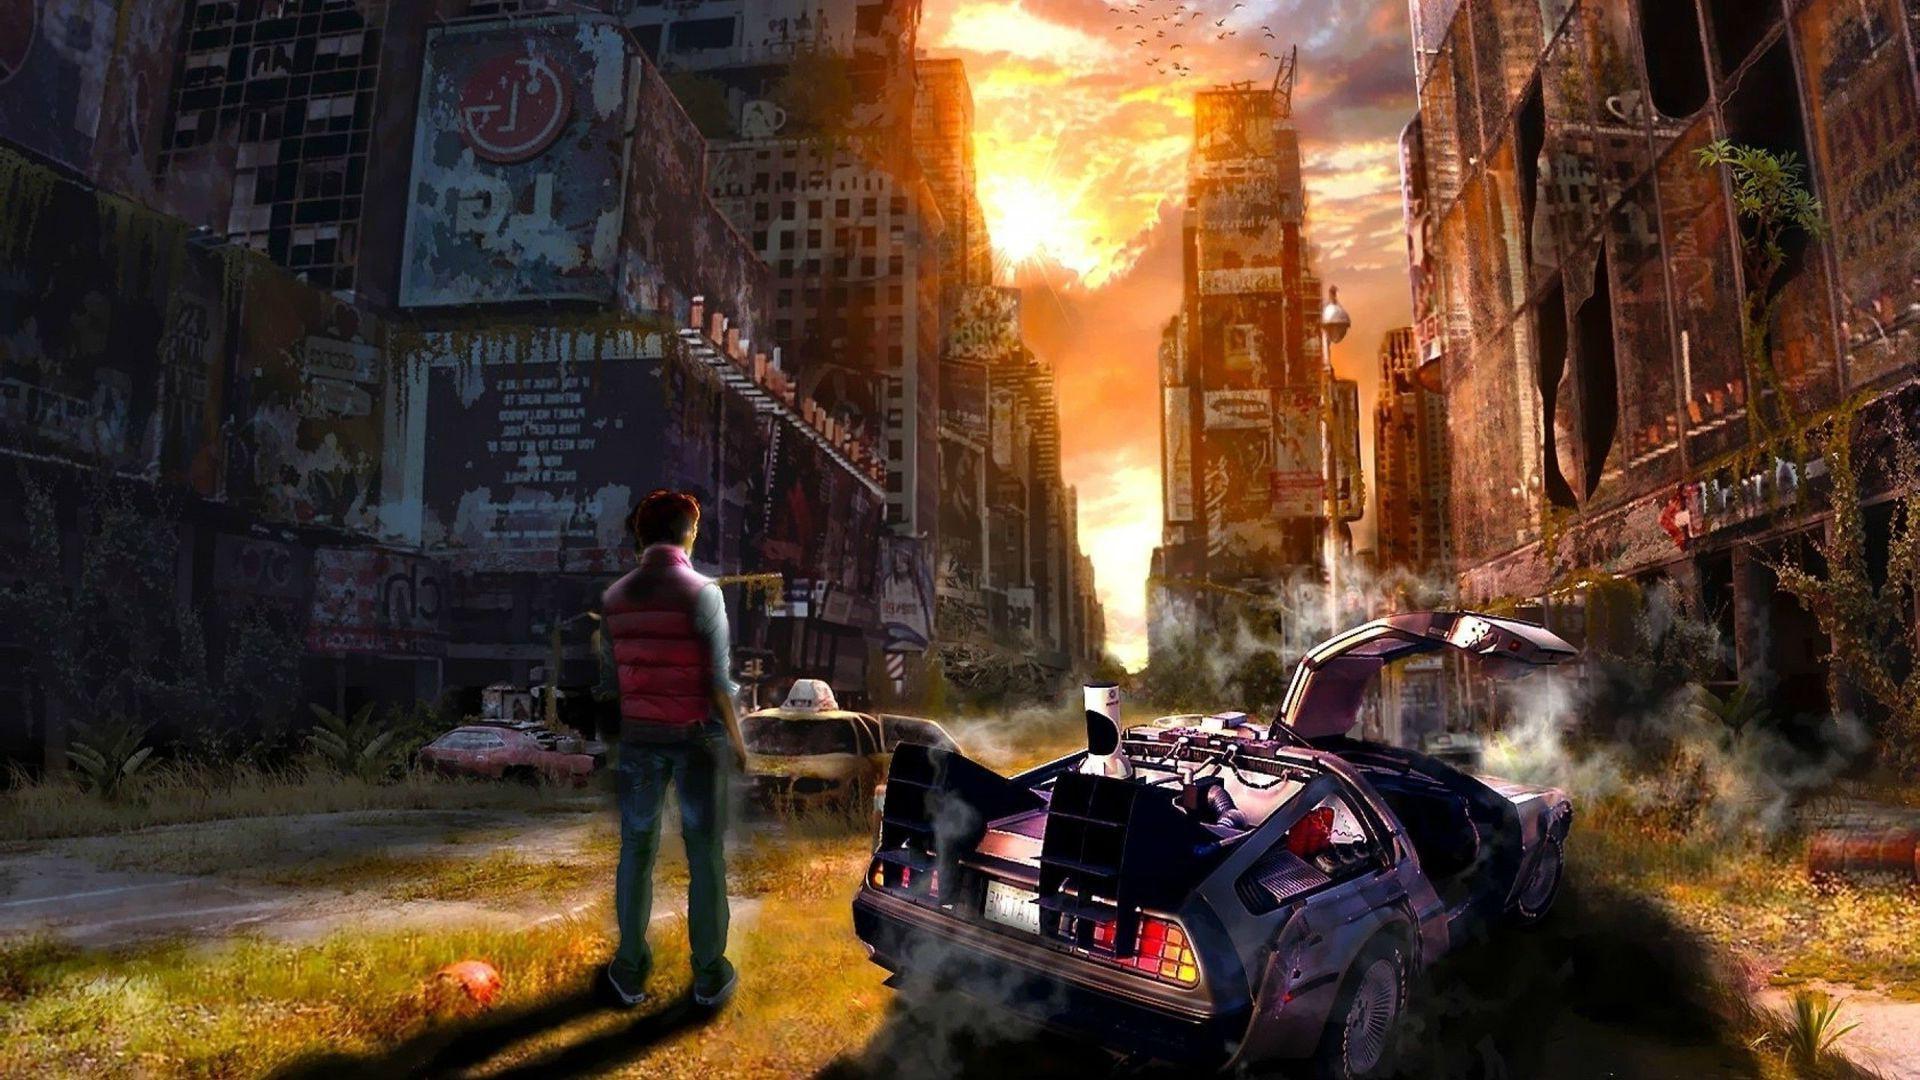 artwork, Back To The Future, Fantasy Art, DeLorean, Digital Art, Concept  Art, Time Wallpapers HD / Desktop and Mobile Backgrounds